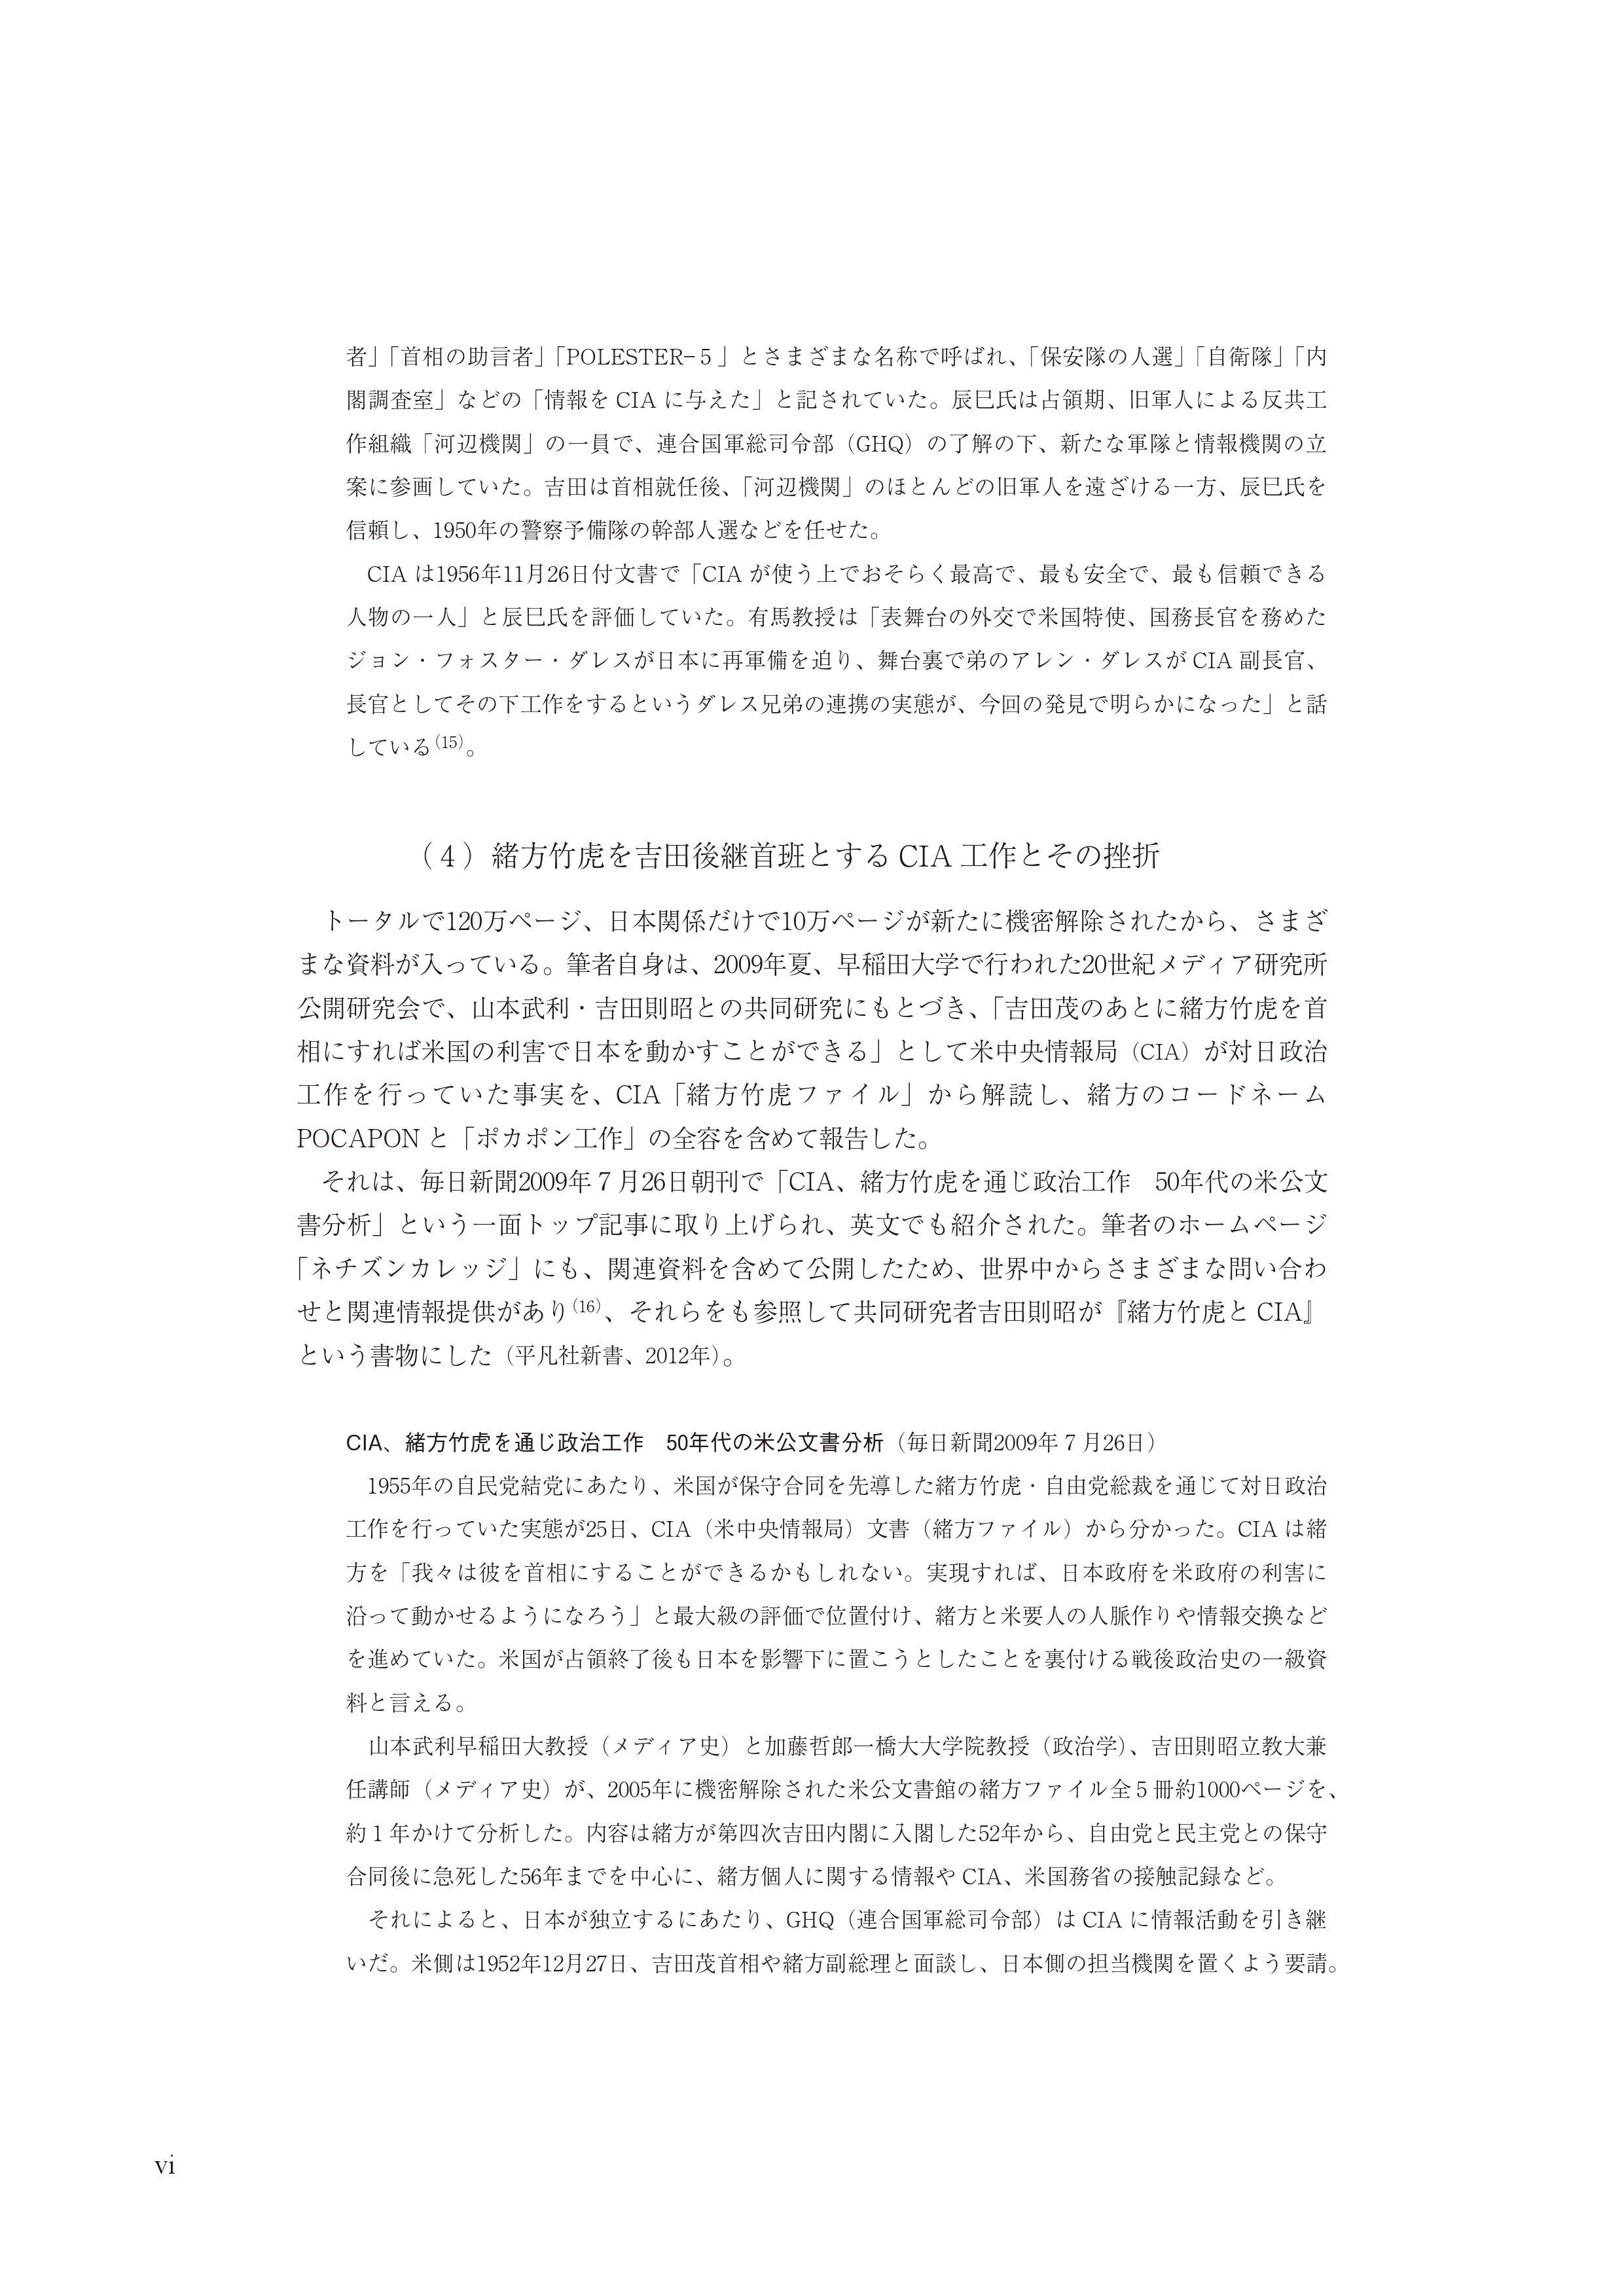 CIA日本人ファイル0001 (6)